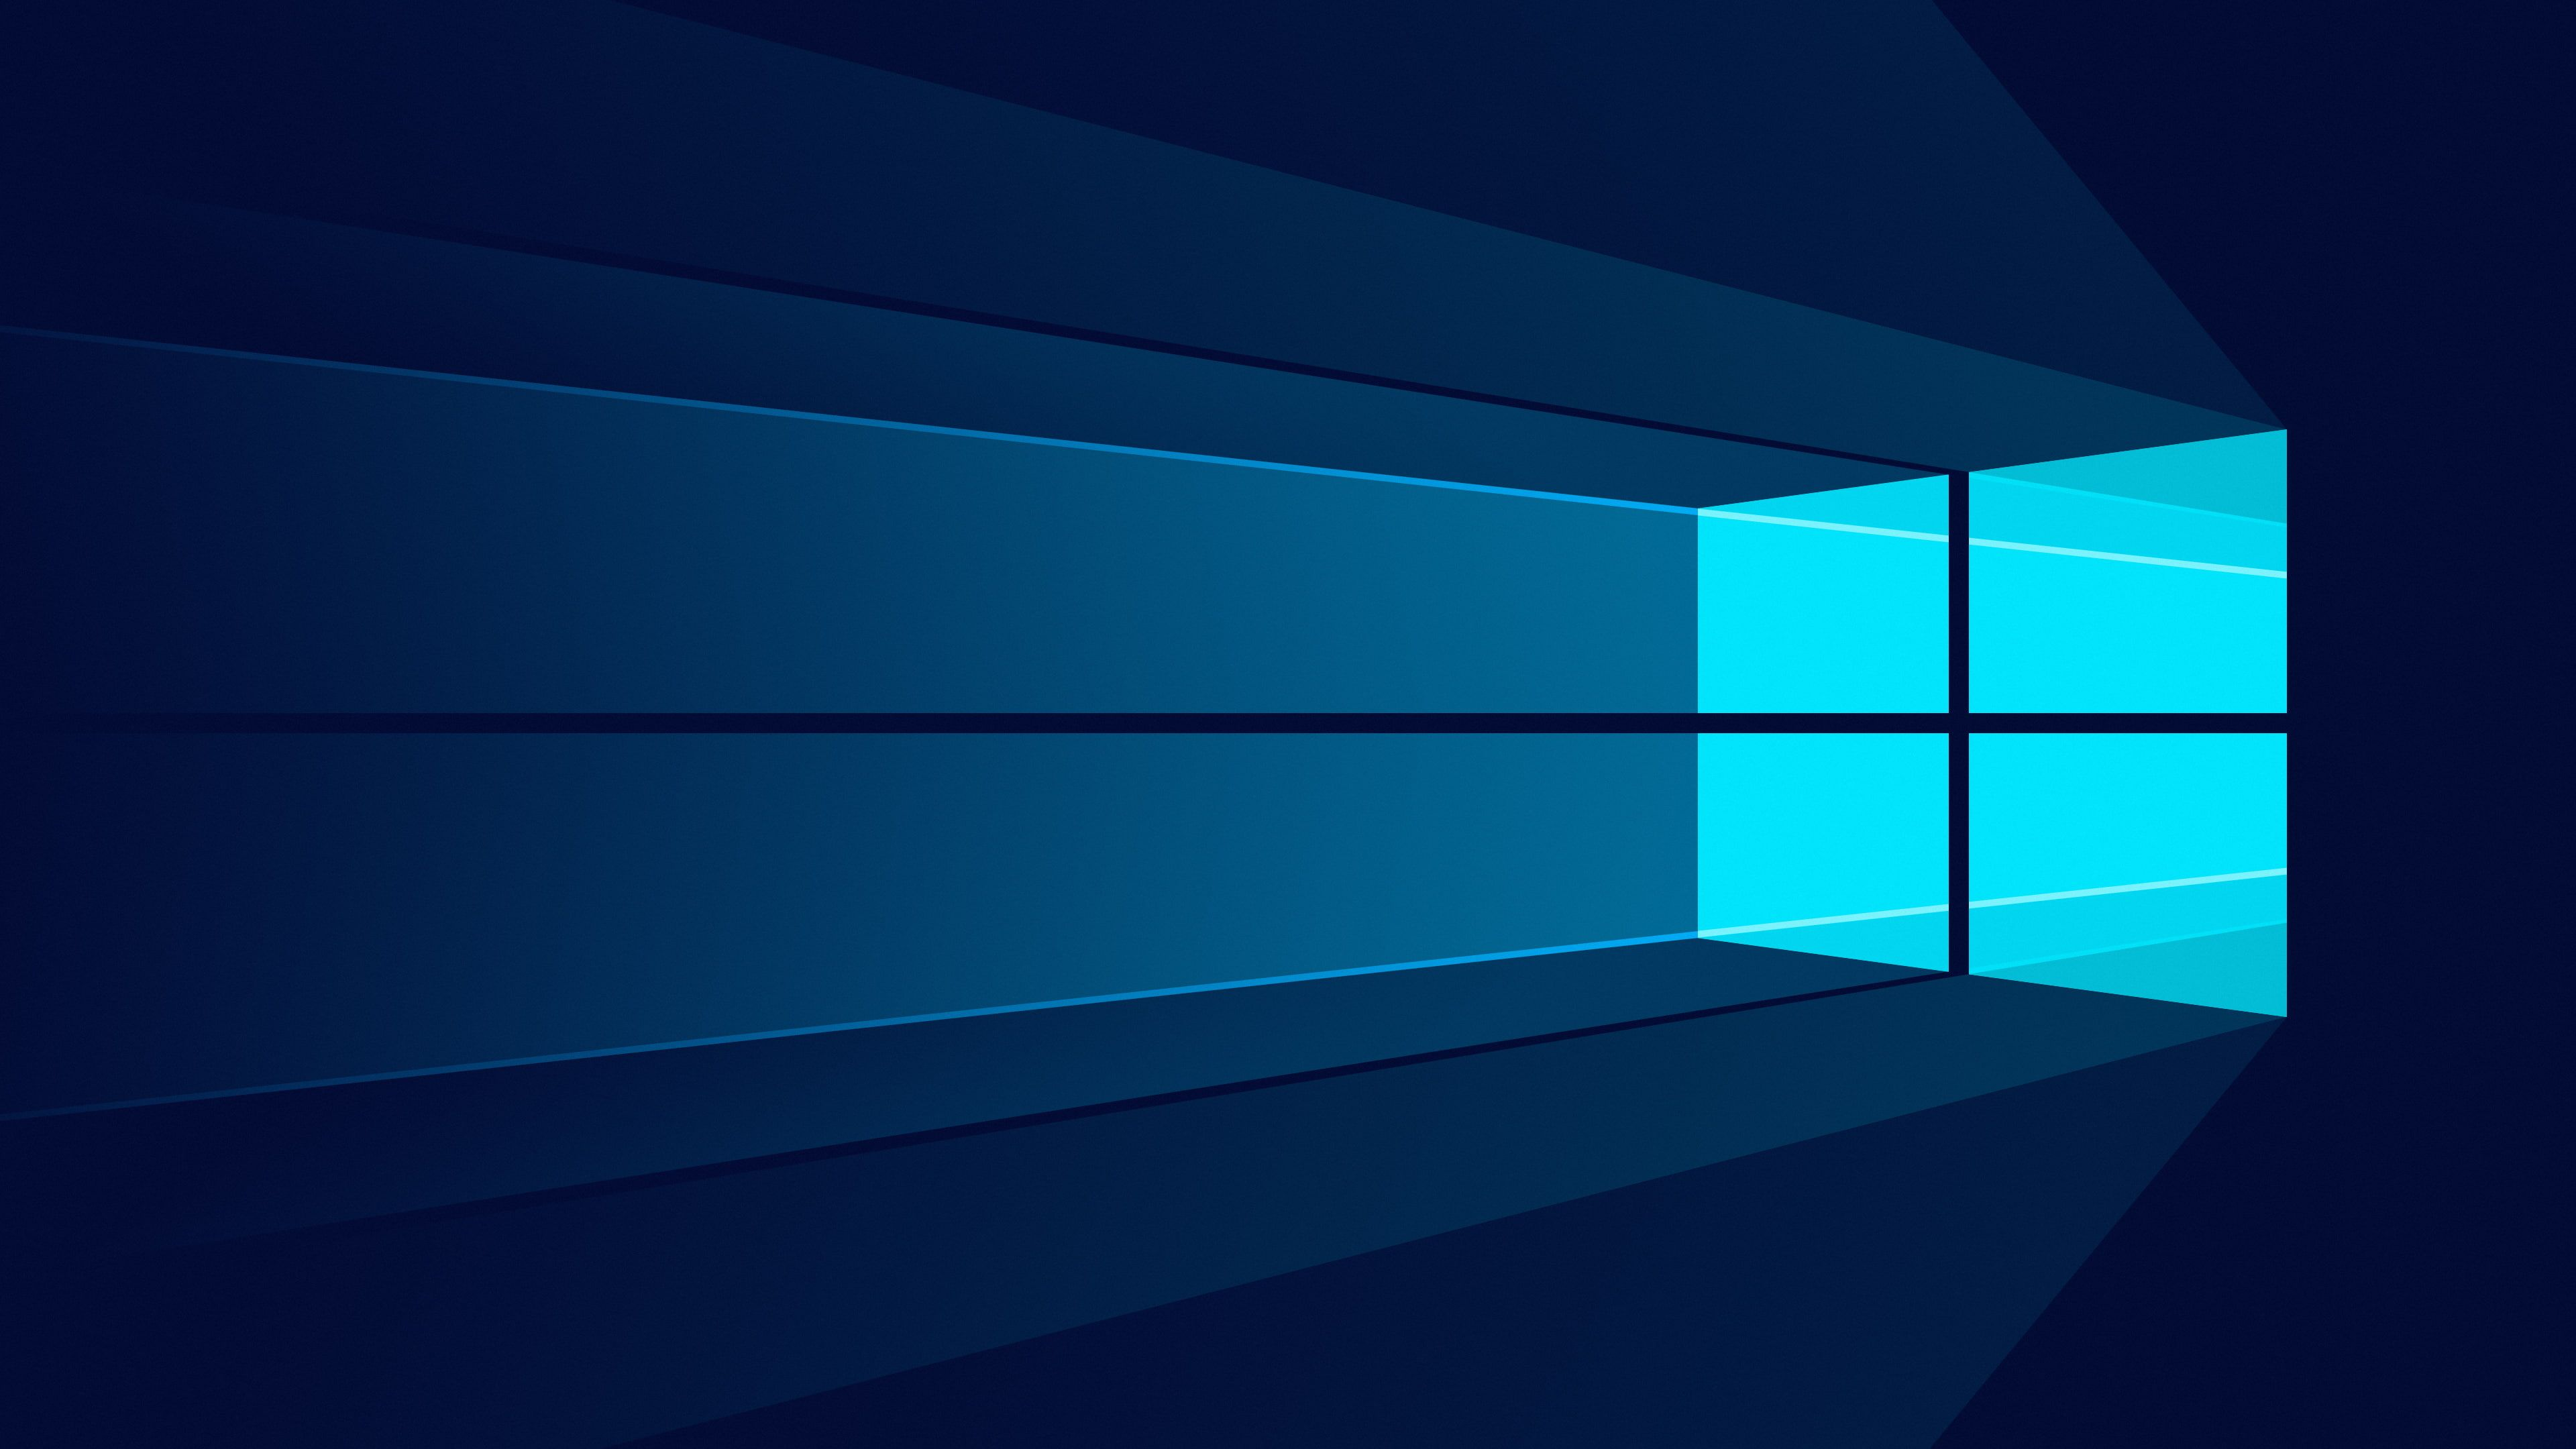 Microsoft Minimal Stock Logo Windows 10 4k 4k Wallpaper Hdwallpaper Desktop Windows 10 Logo Windows Wallpaper Windows 10